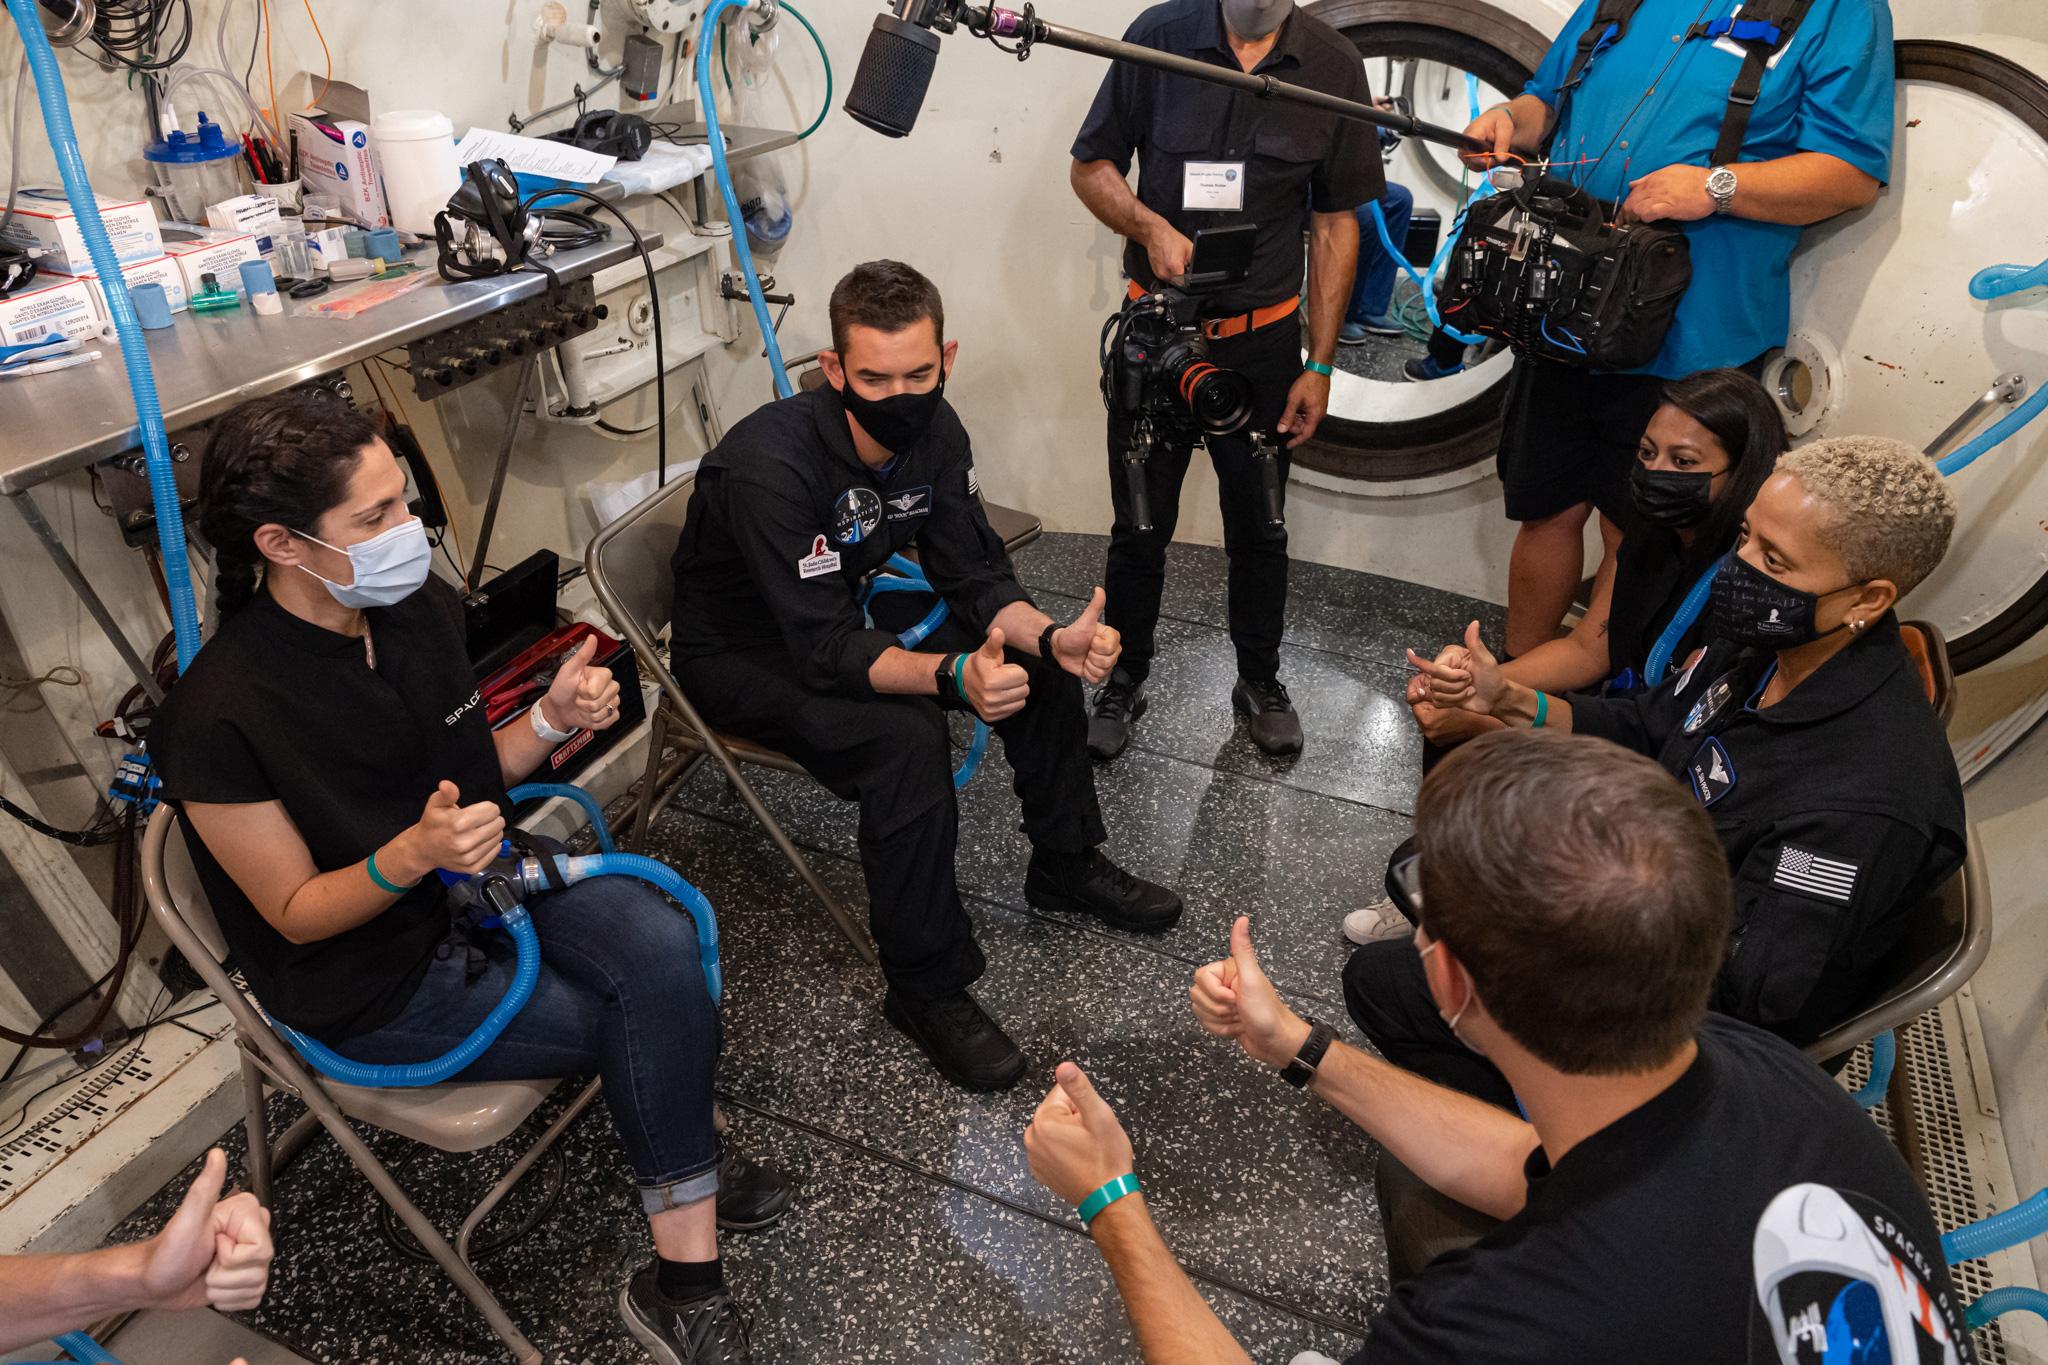 Altitude chamber training at Duke Health in Durham, North Carolina, Jul. 2, 2021.